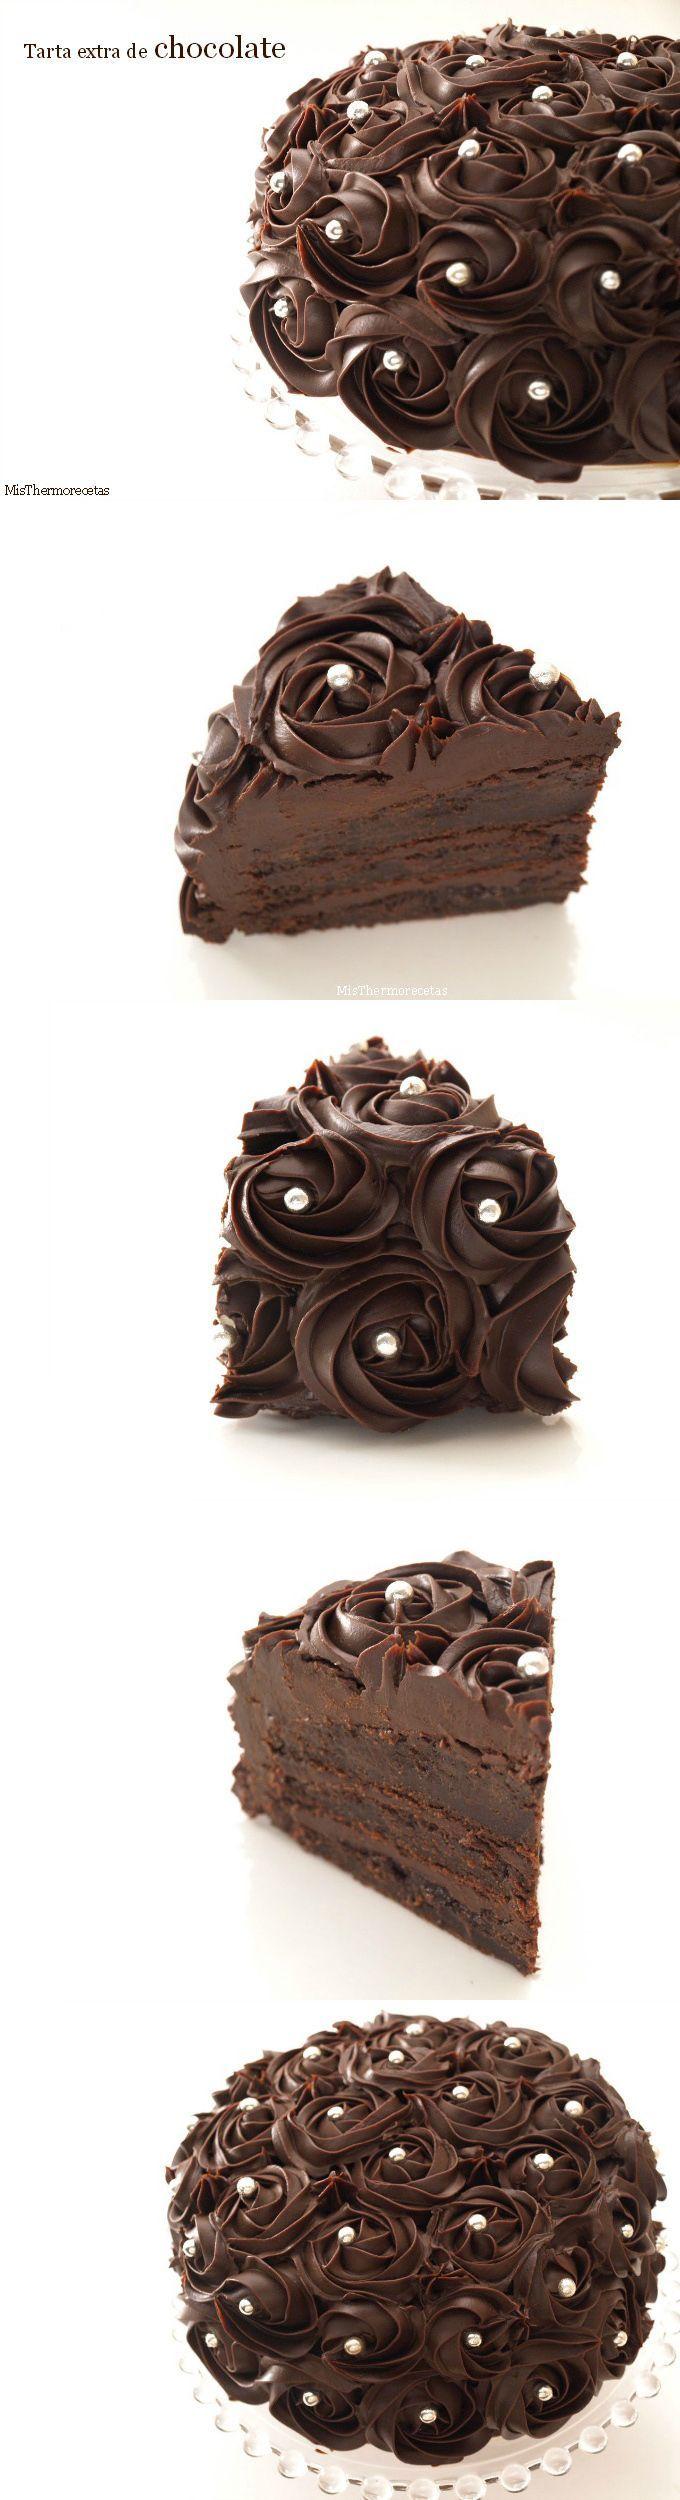 Tarta extra de chocolate (thermomix).